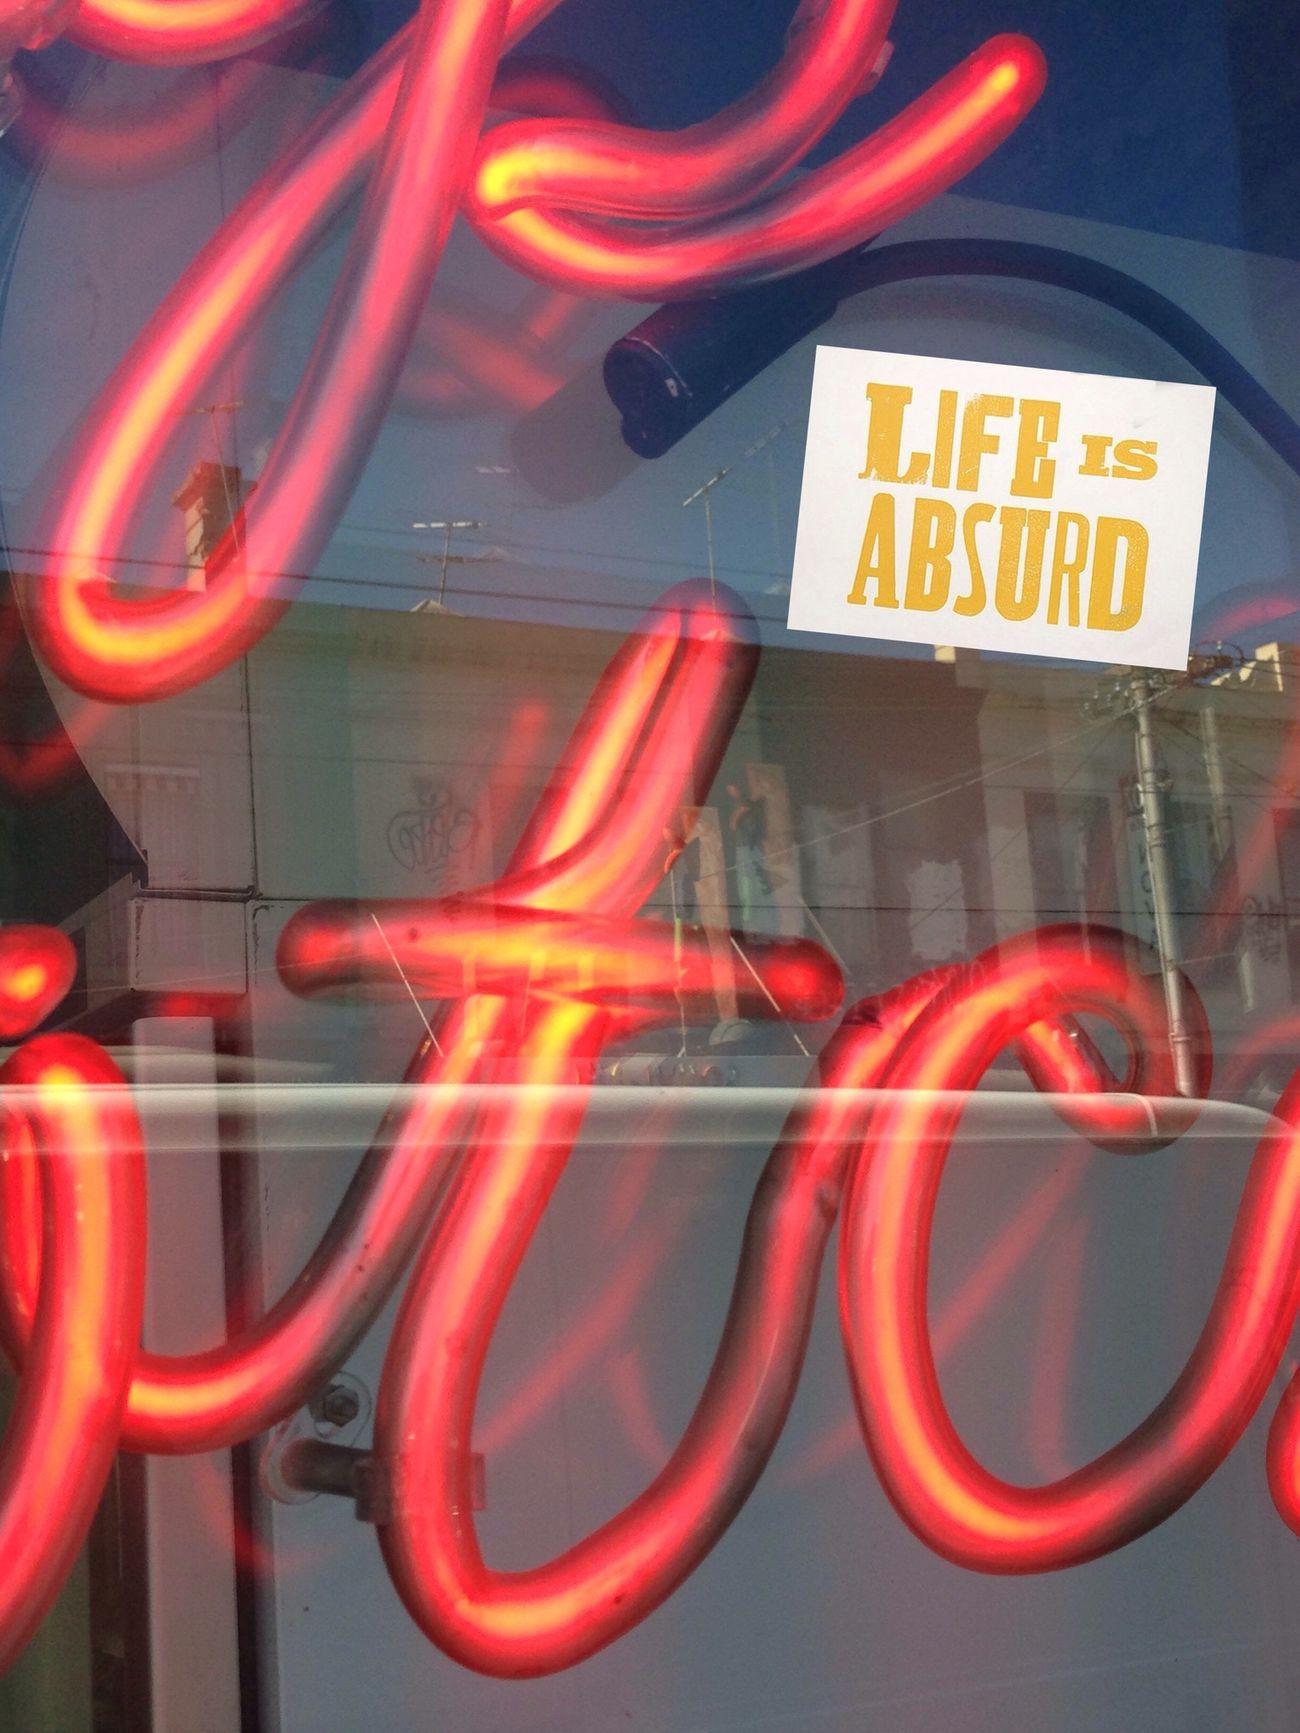 Life Is Absurd!!! On neon